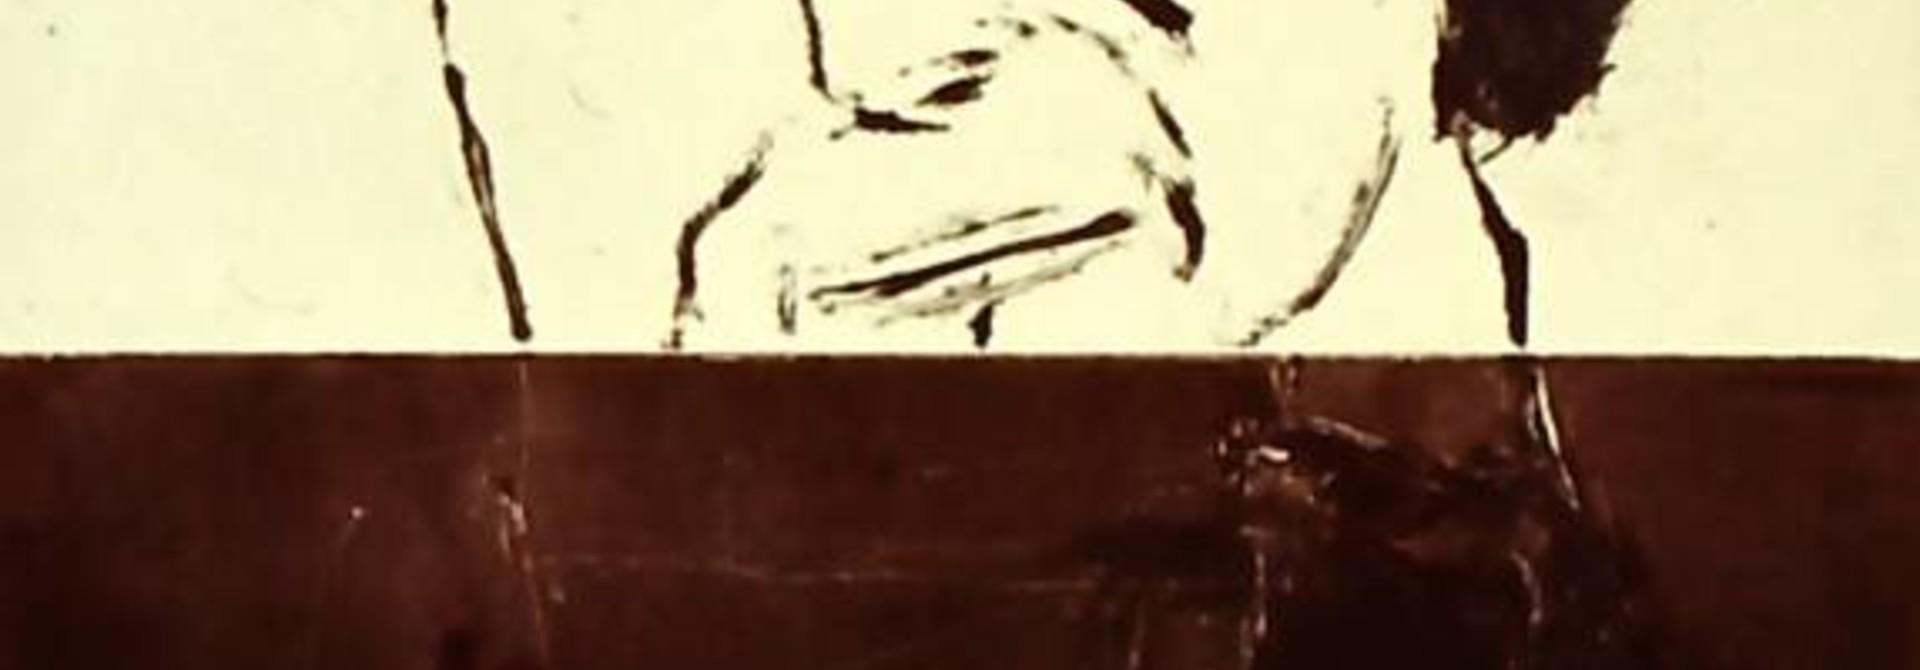 2/20 monoprints